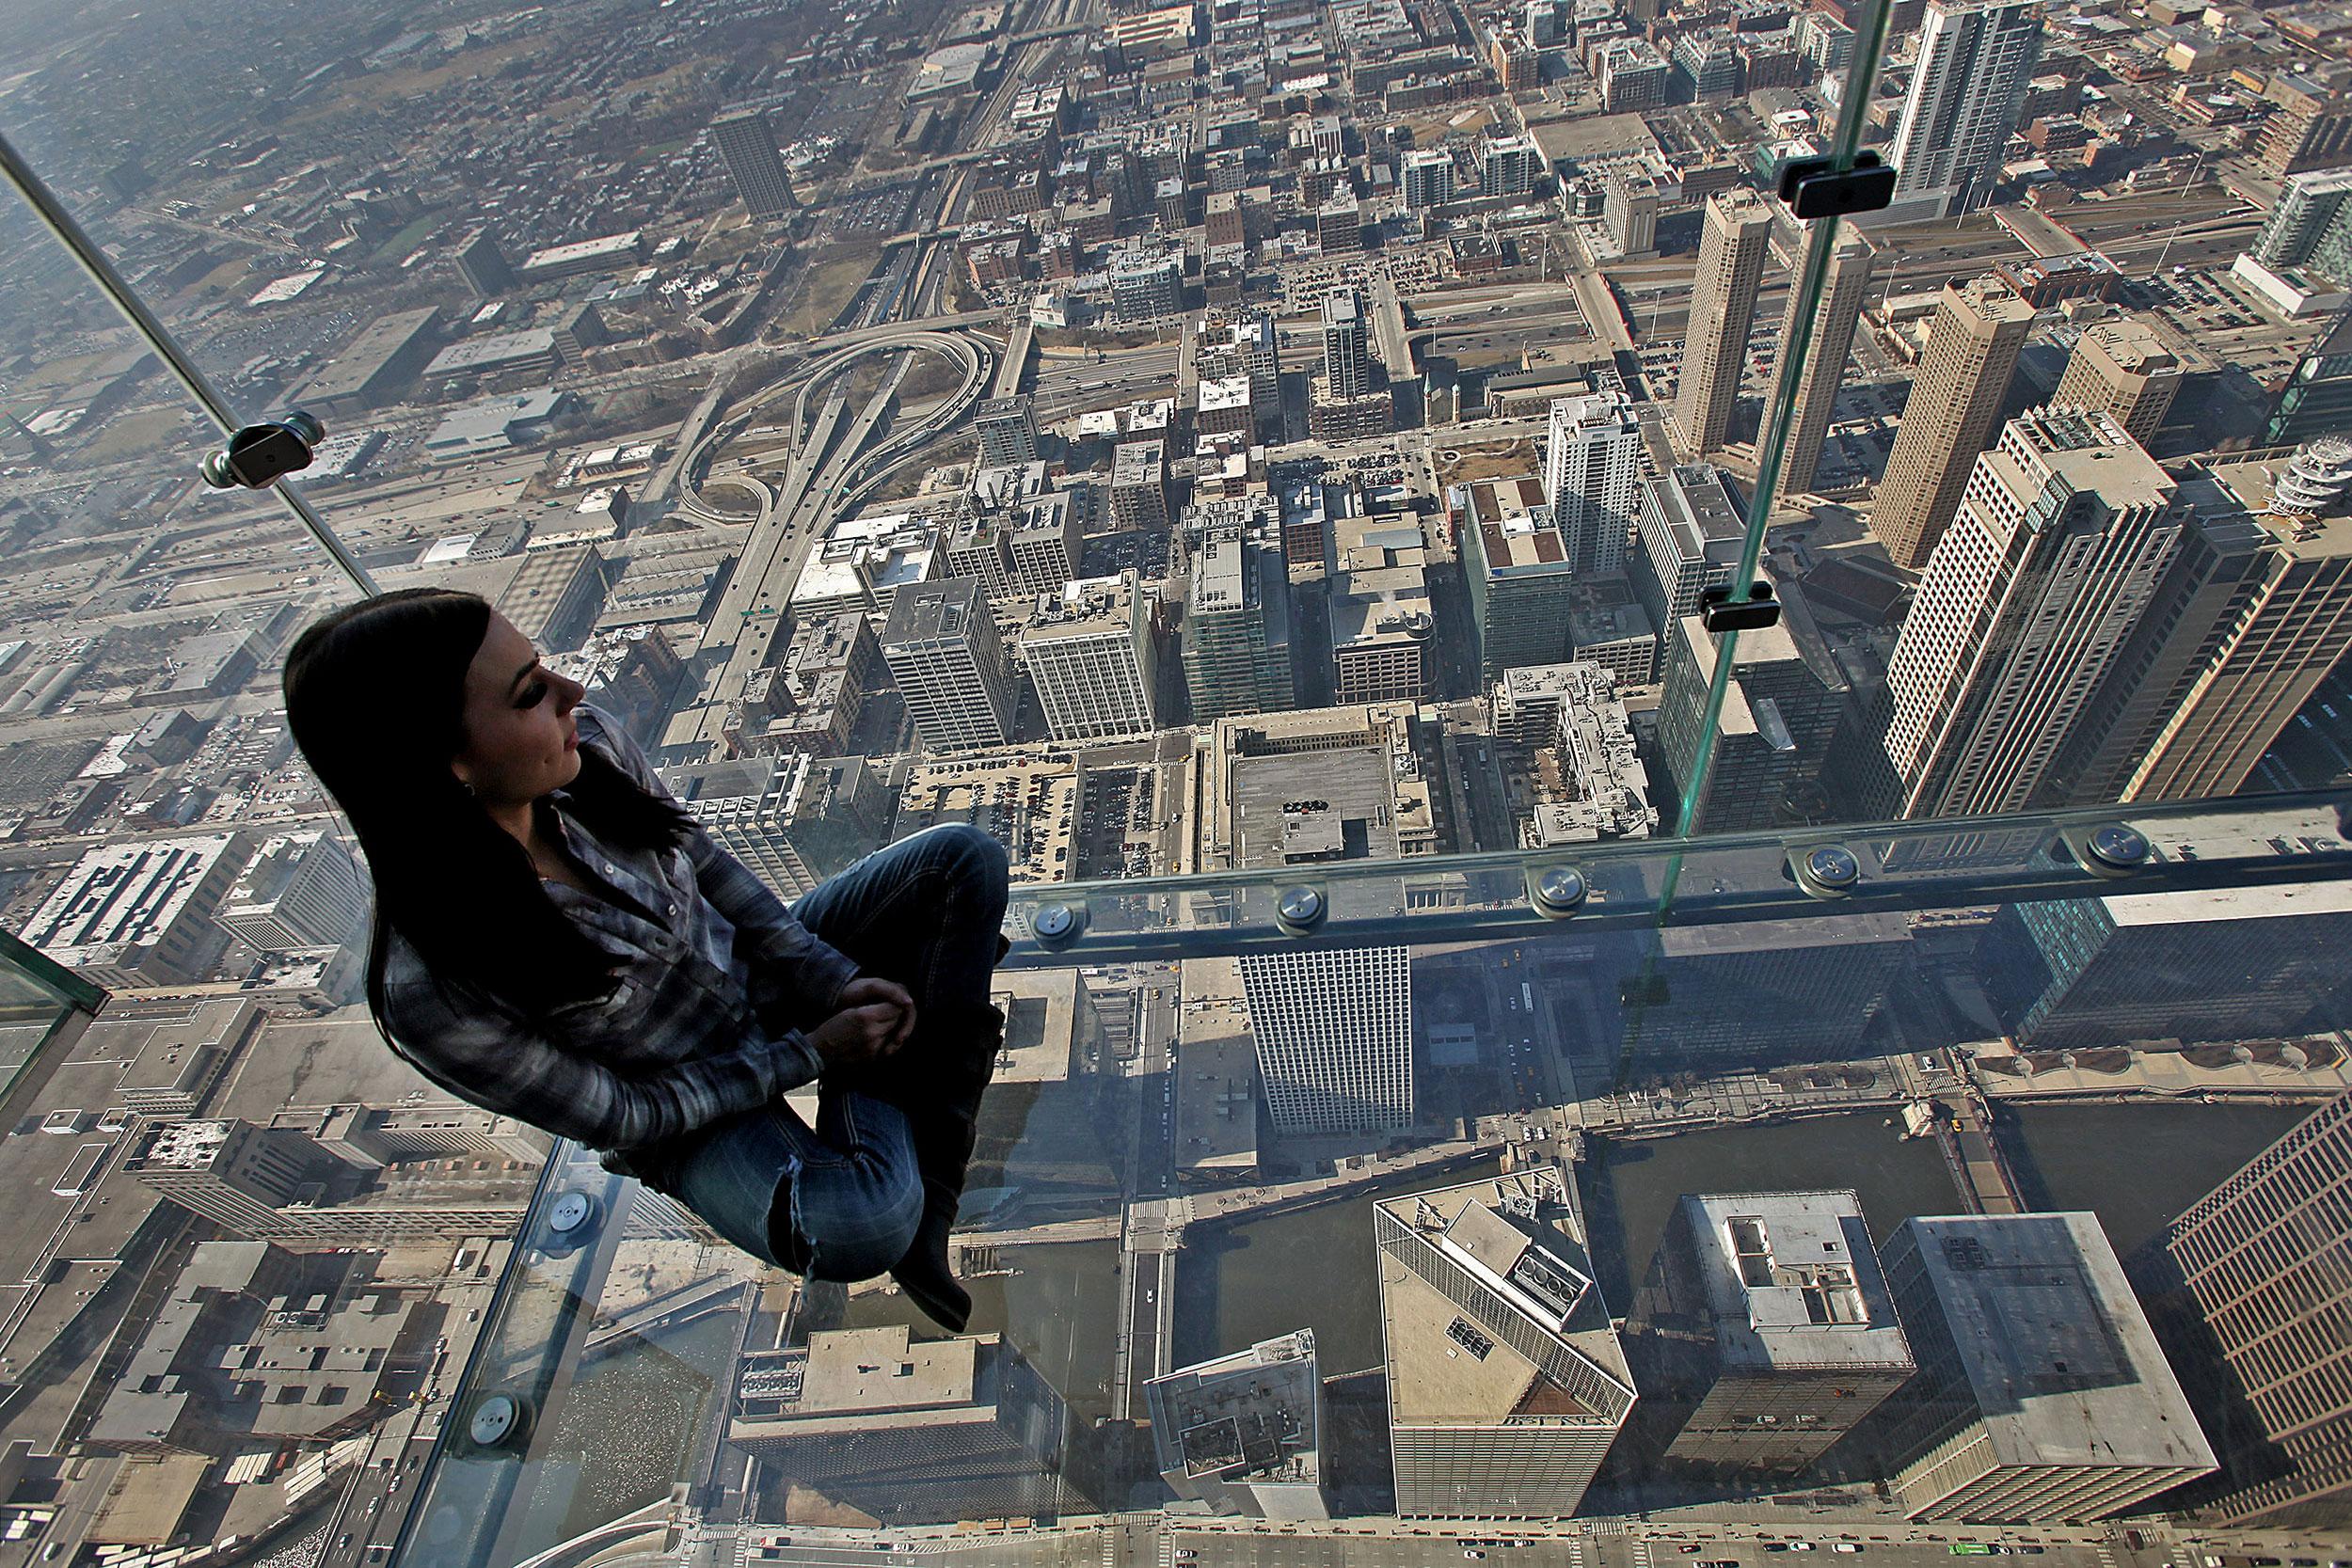 Blackstone to Buy Chicago's Willis Tower for $1.3 Billion ...